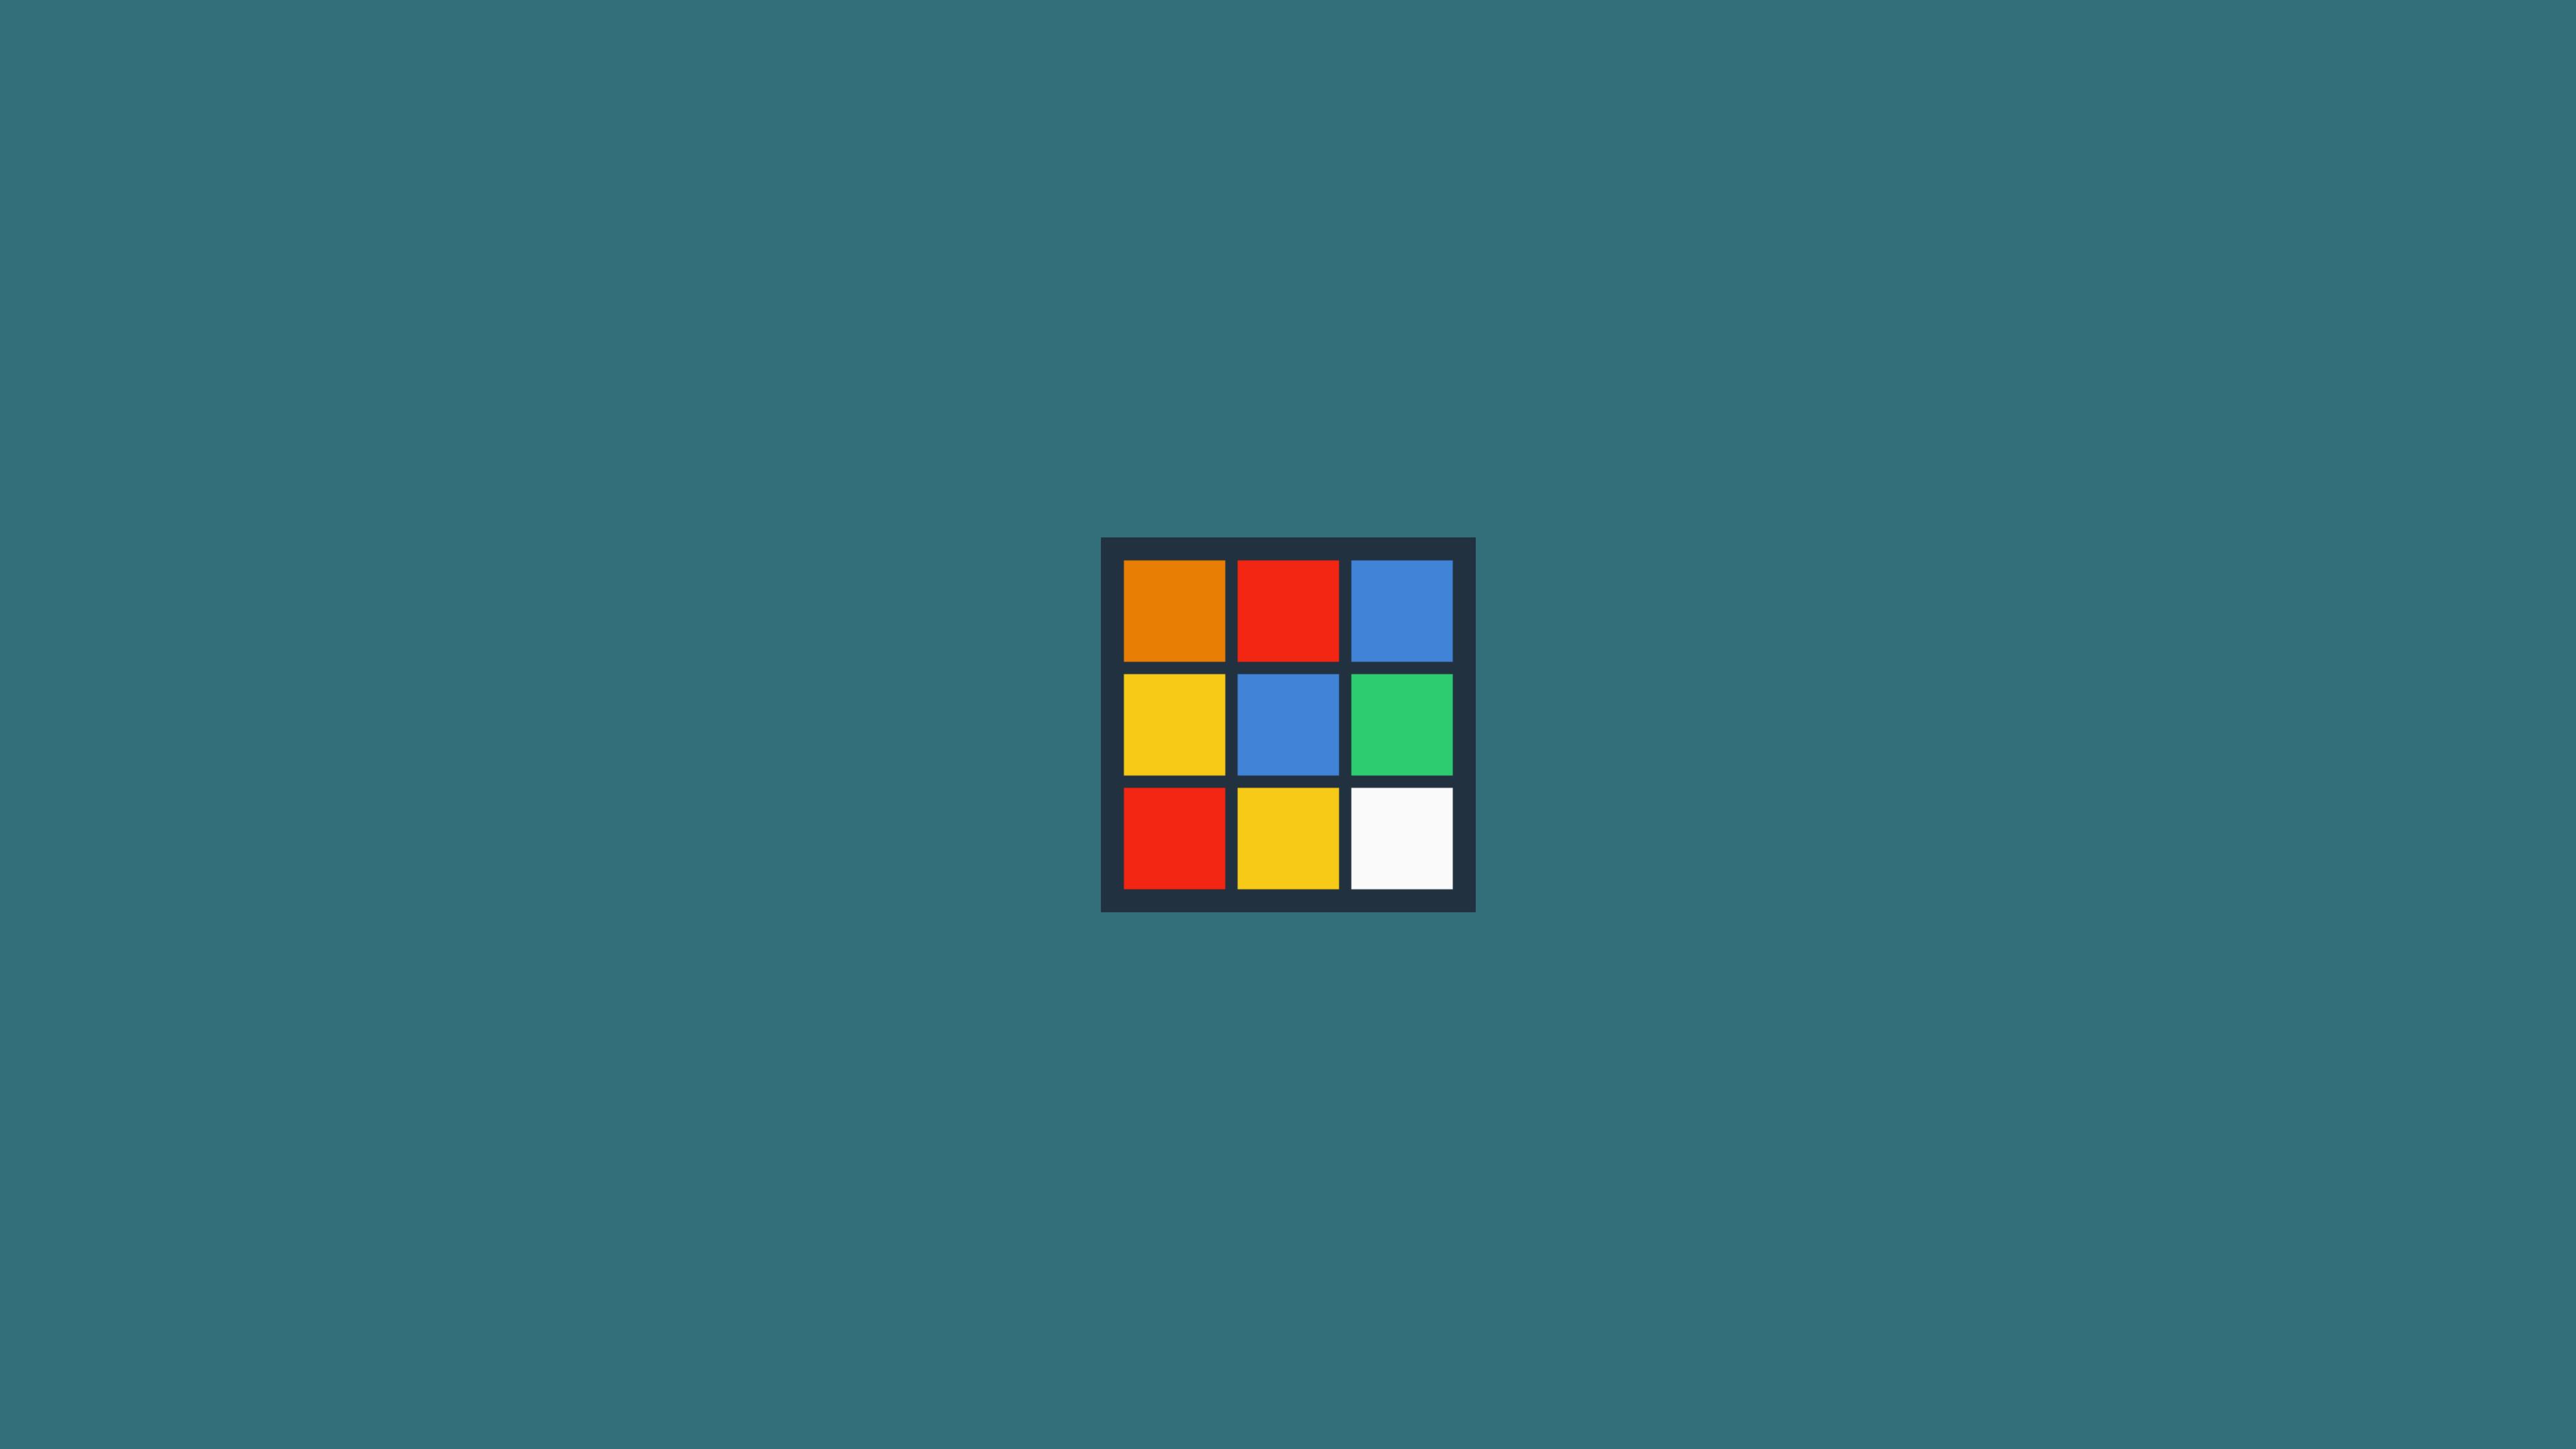 Wallpaper Minimalism Rubik S Cube Cube Blue Background